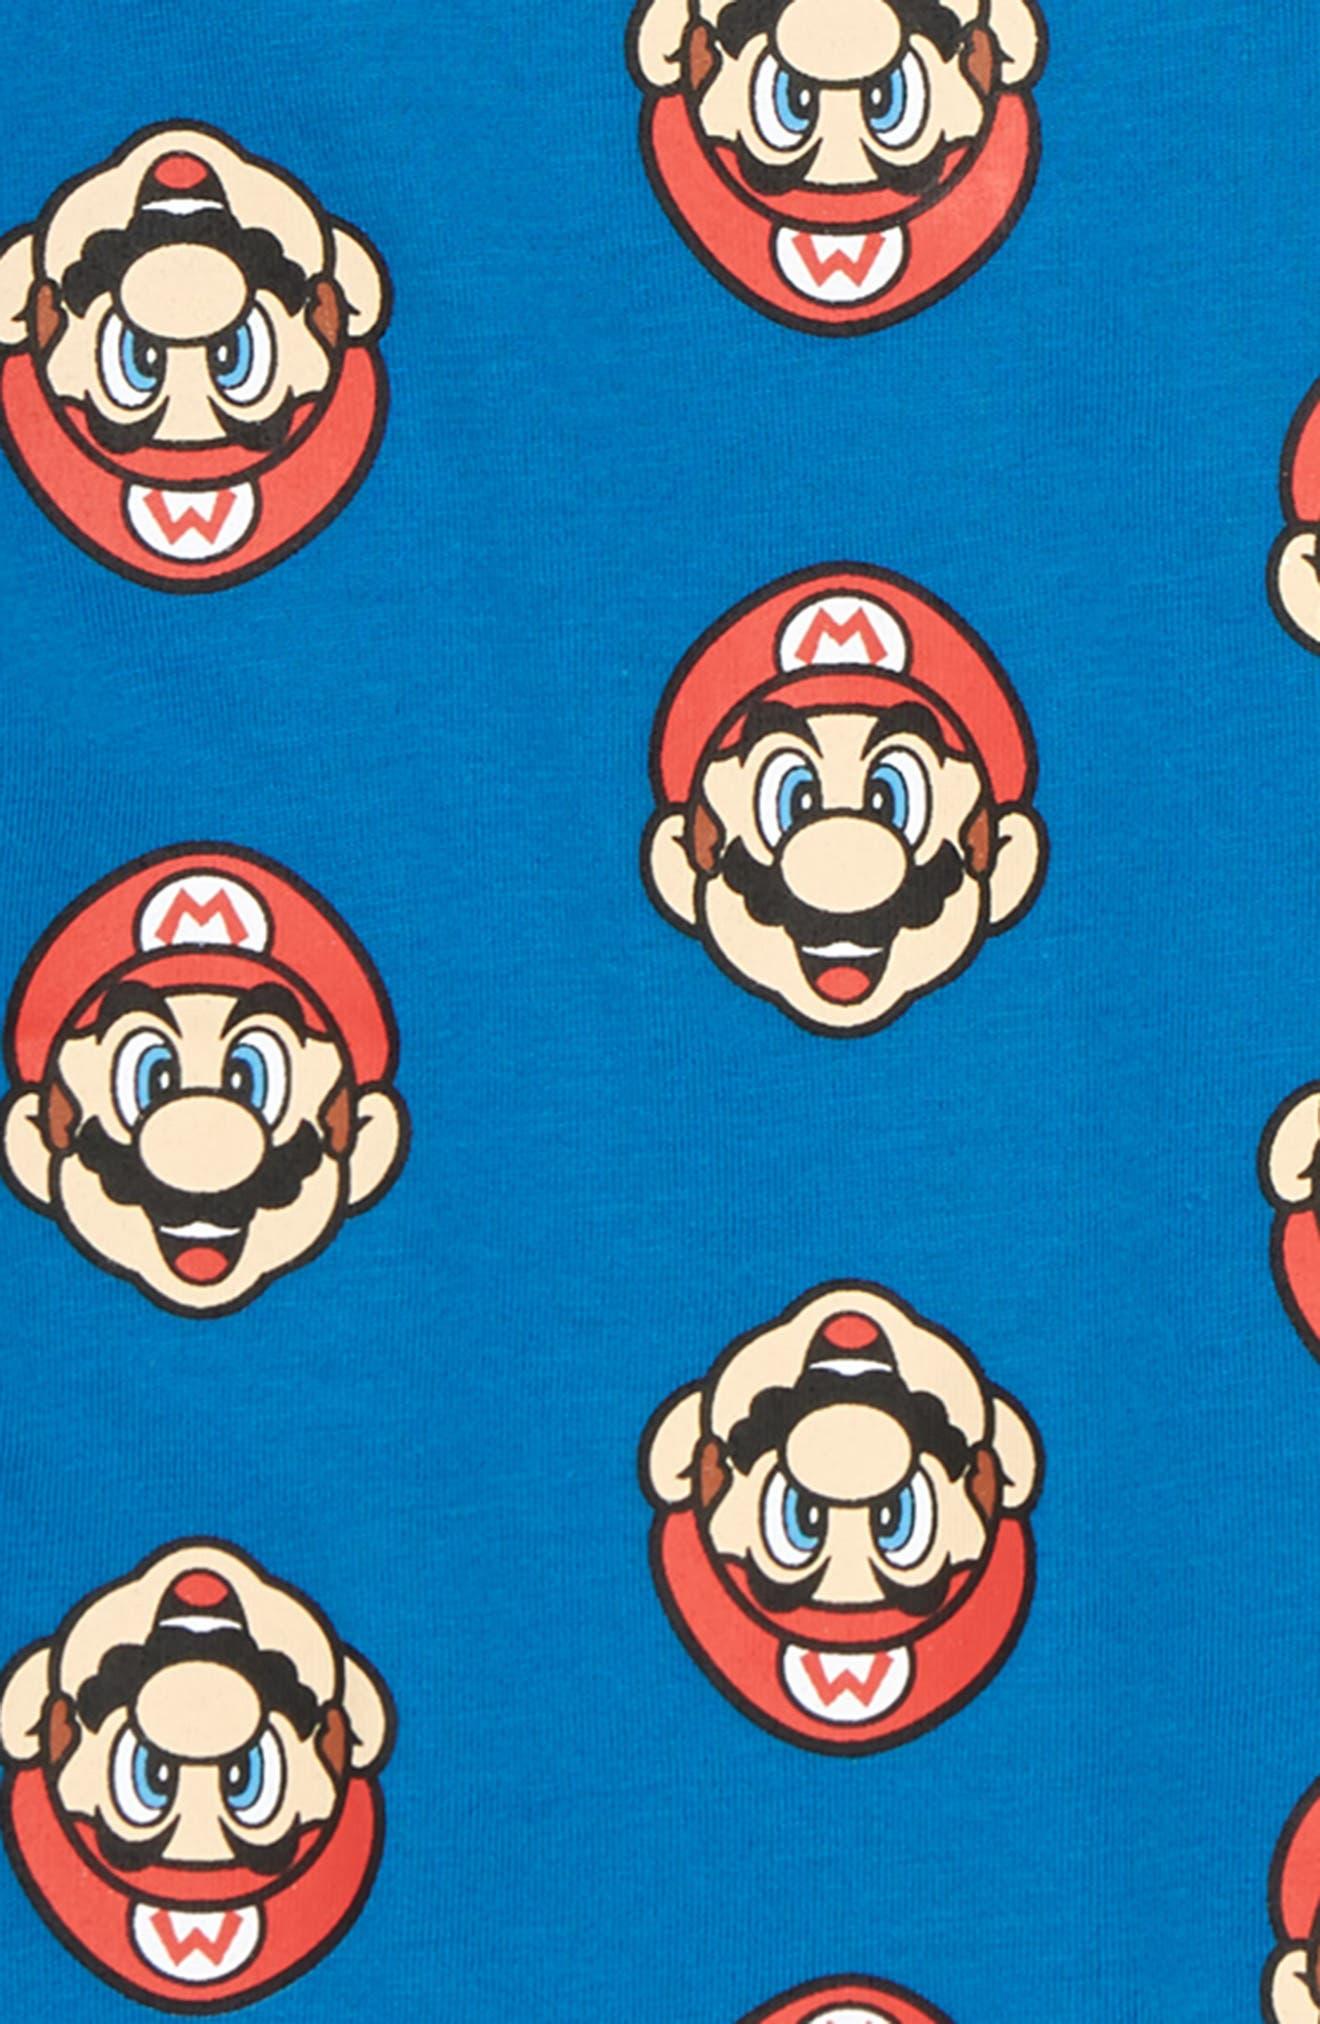 Nintendo Mario<sup>®</sup> Print T-Shirt,                             Alternate thumbnail 2, color,                             428